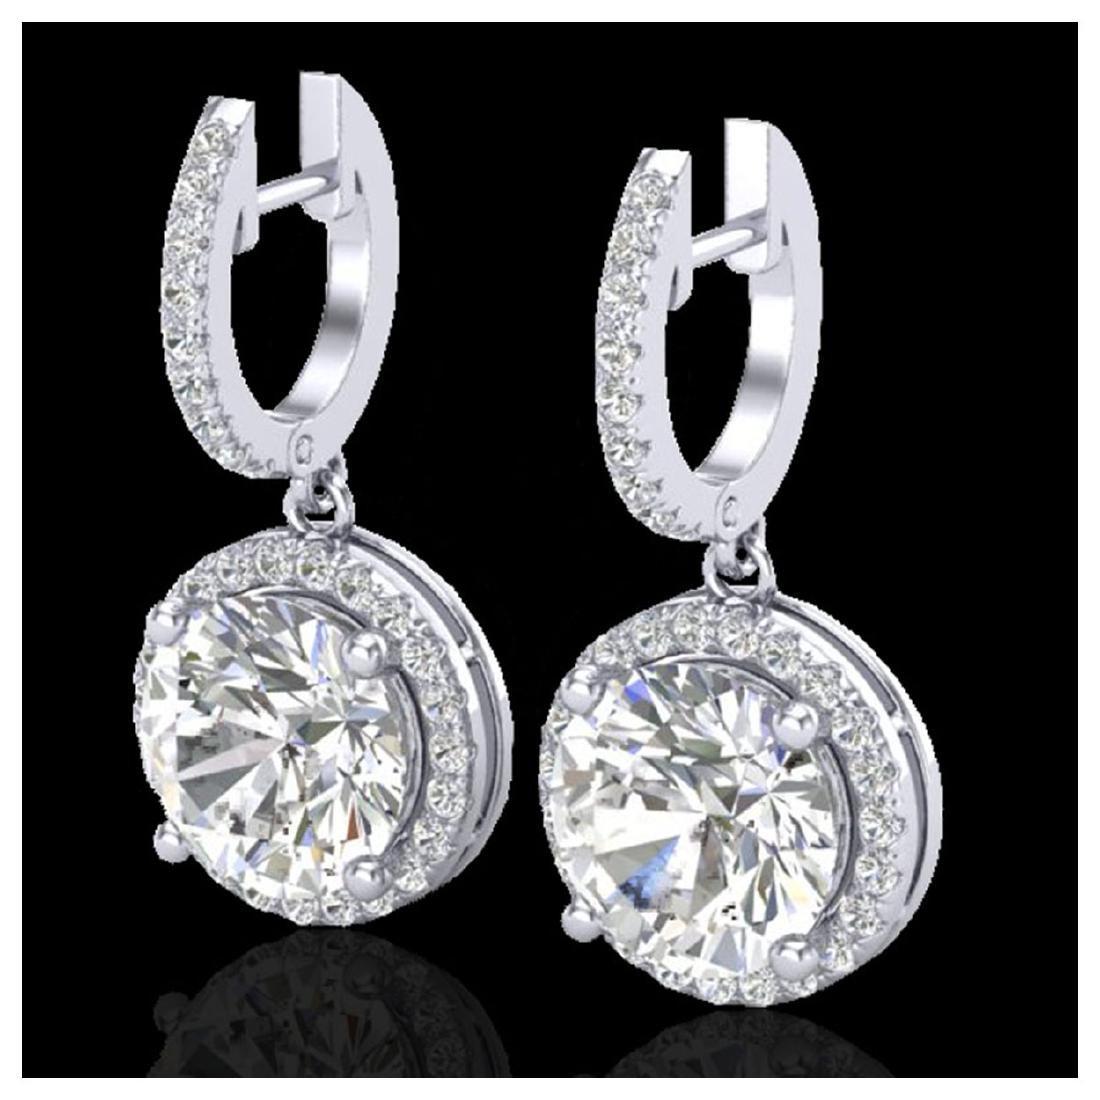 4.50 CTW VS/SI Diamond Halo 18K Gold - REF-1868G2N -